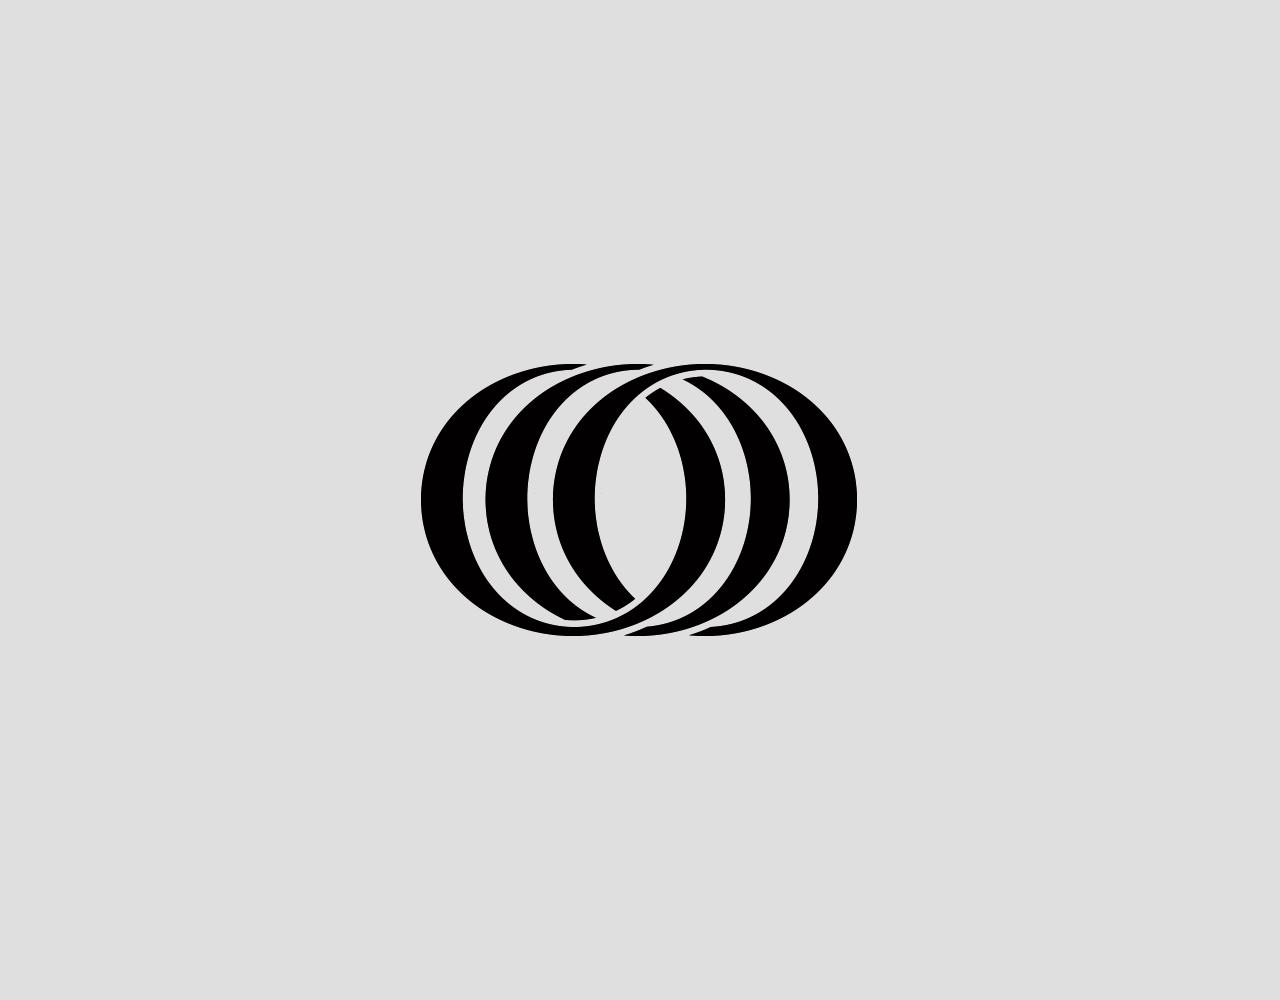 Kevin-Kwok-Design-Logofolio-9